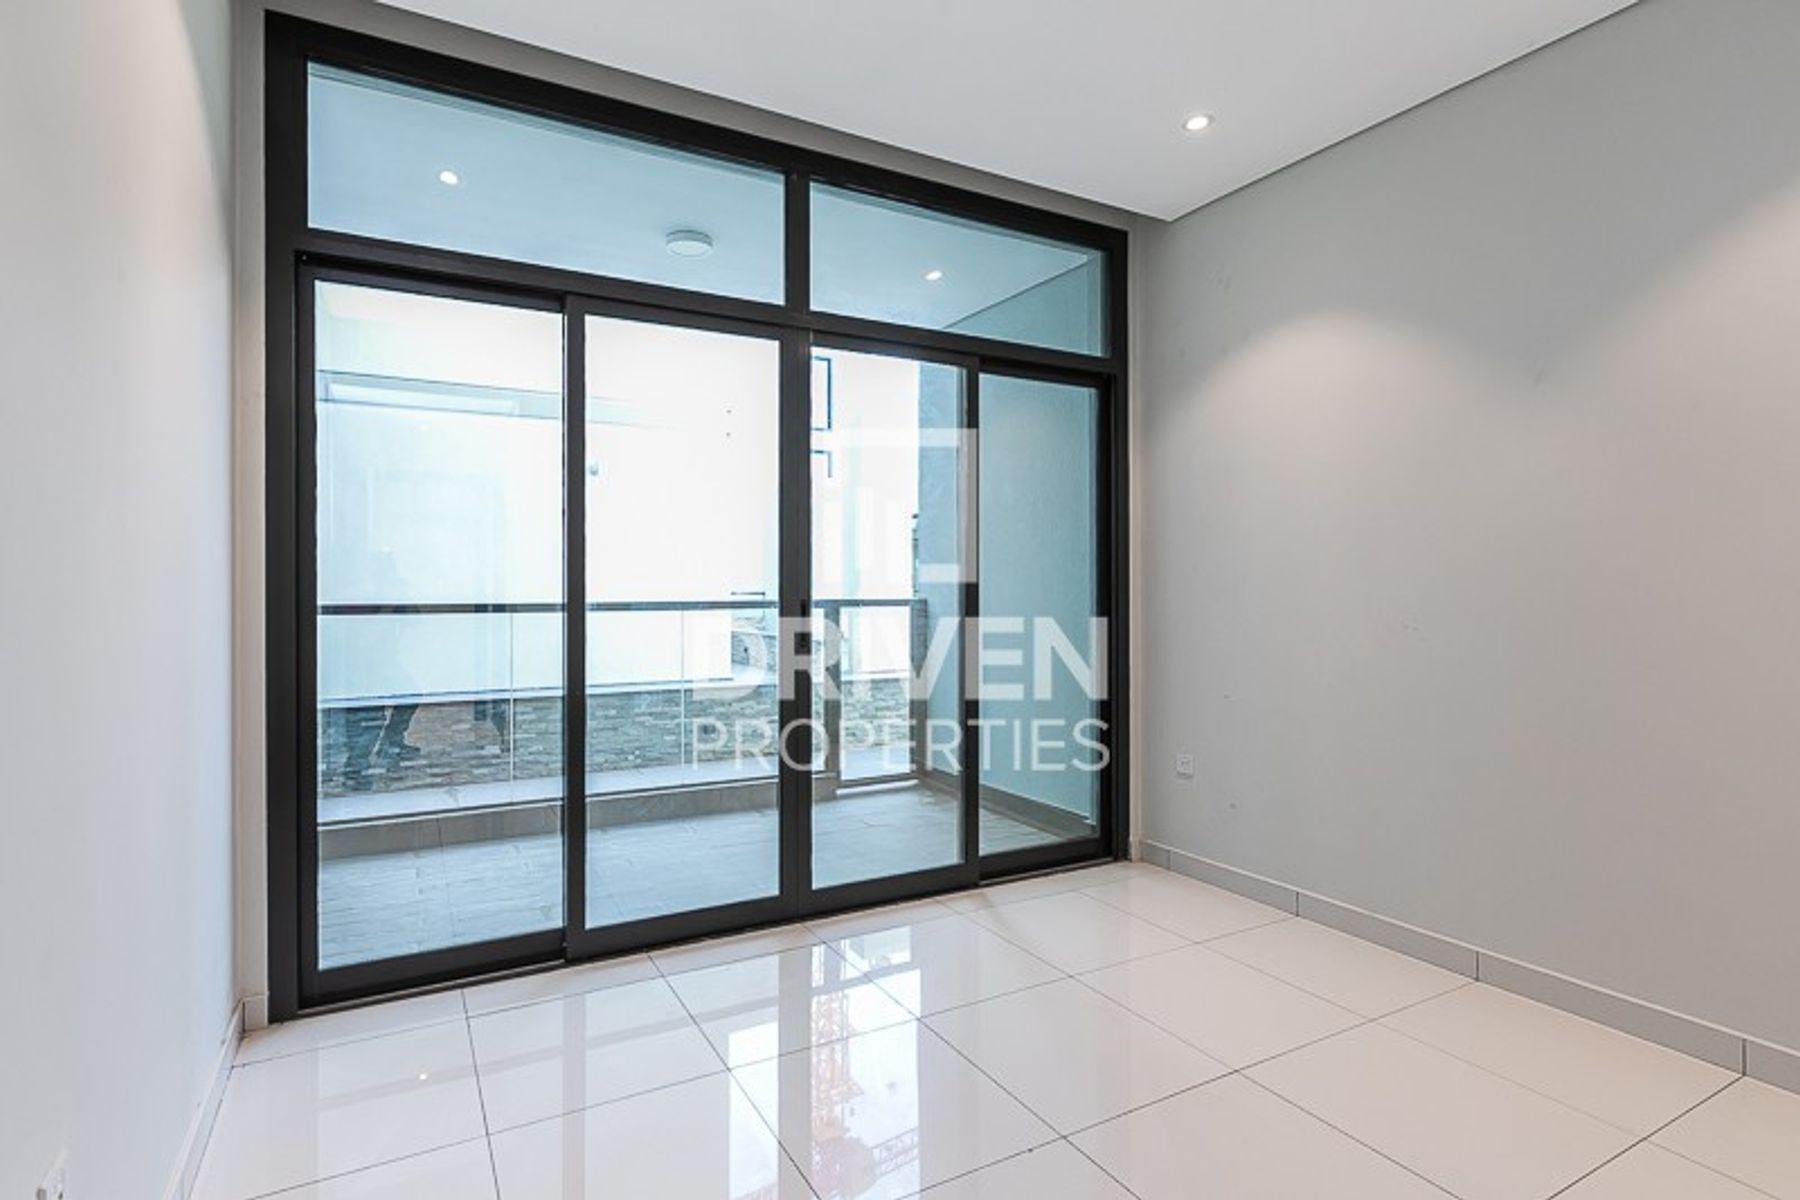 للايجار - شقة - جاليريز في ميدان افينيو - ميدان